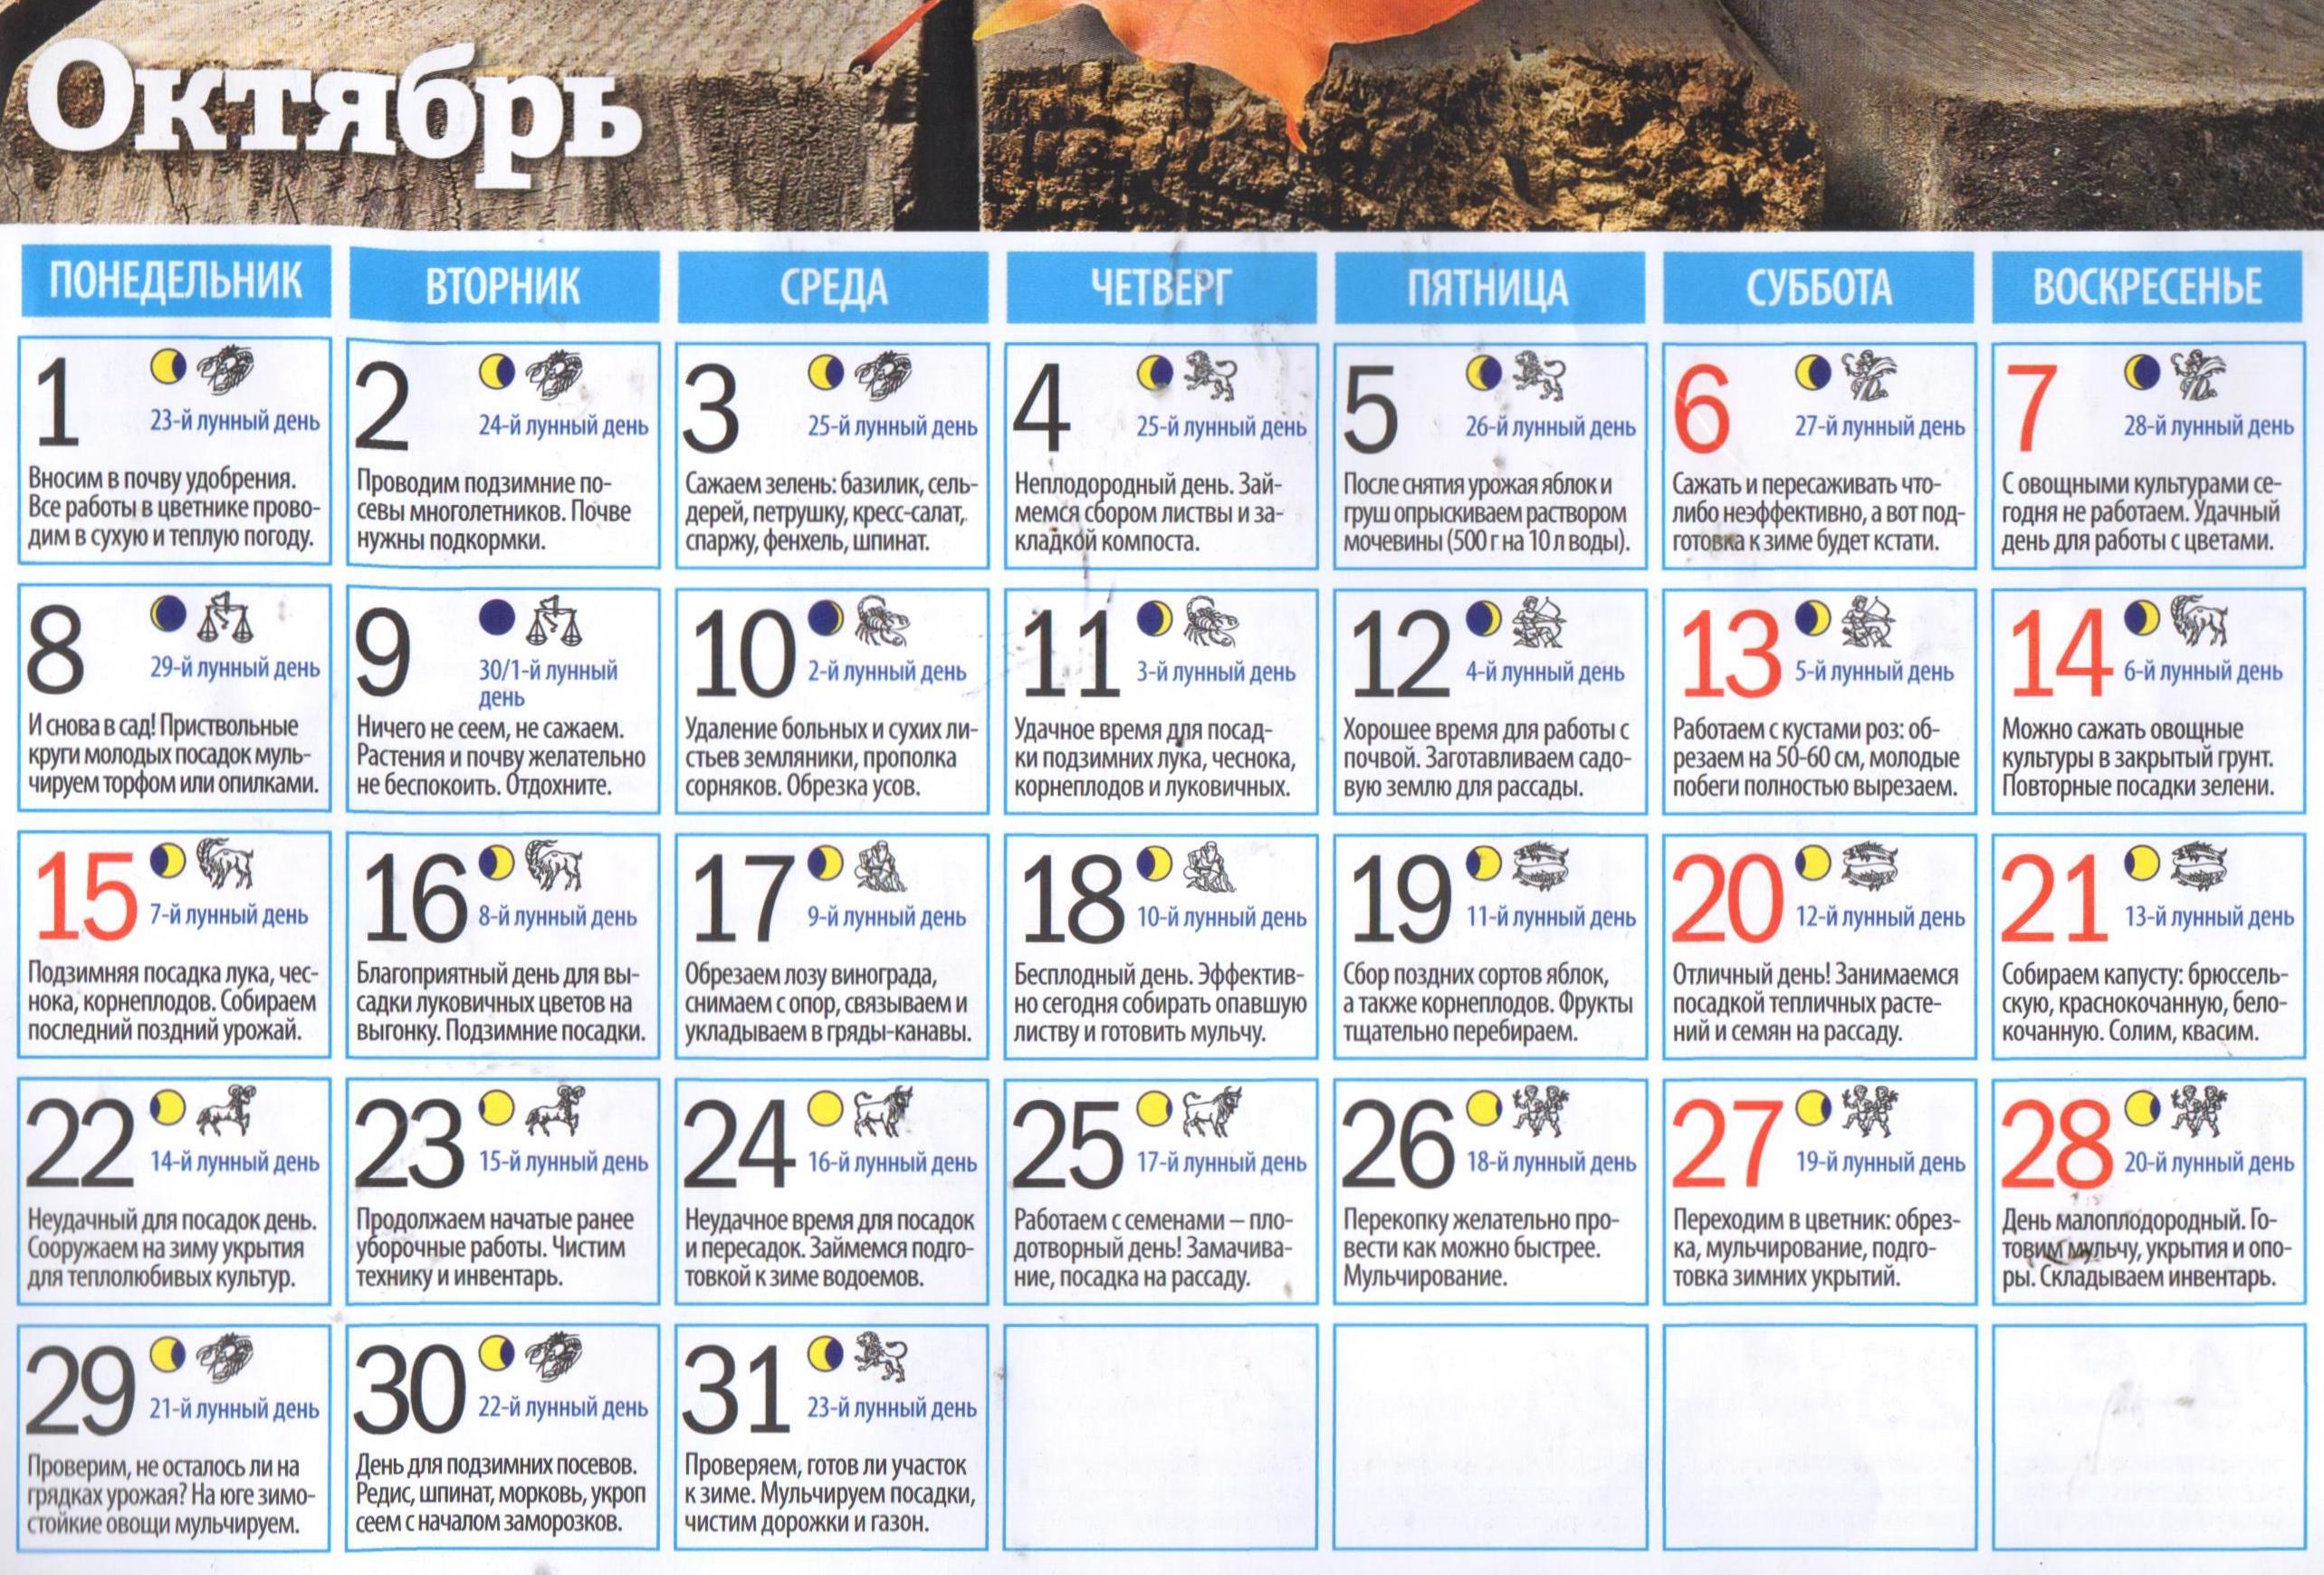 Лунный календарь огородника на октябрь 2018 года